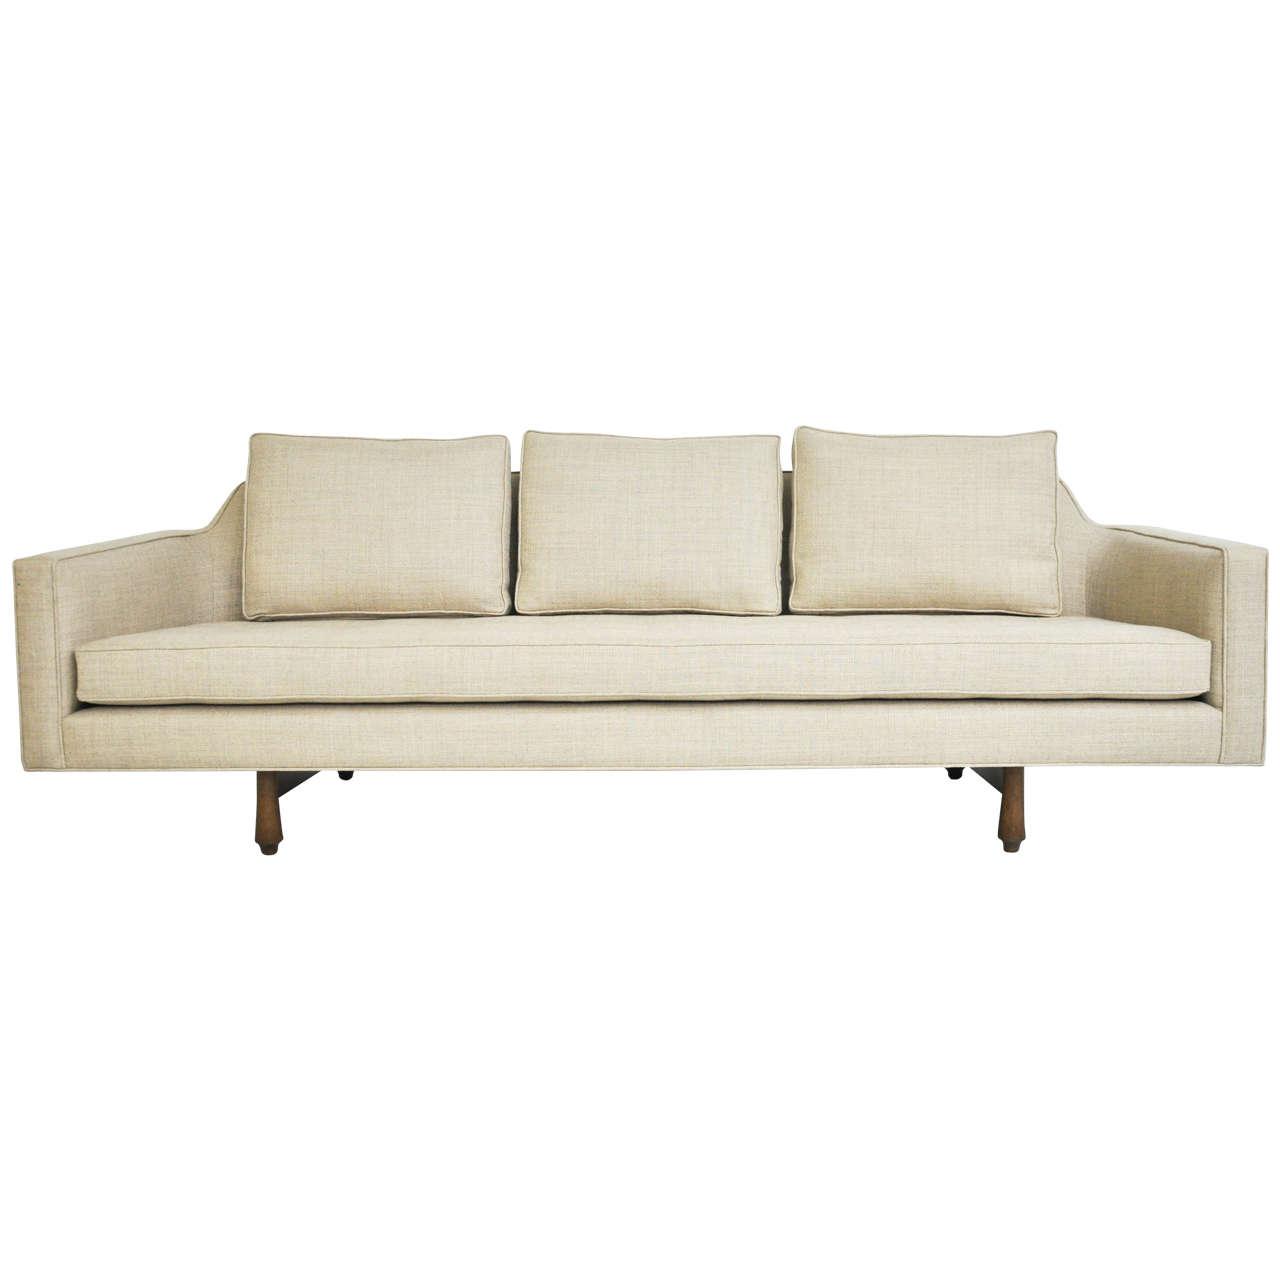 Dunbar Curved Back Sofa By Edward Wormley At 1stdibs